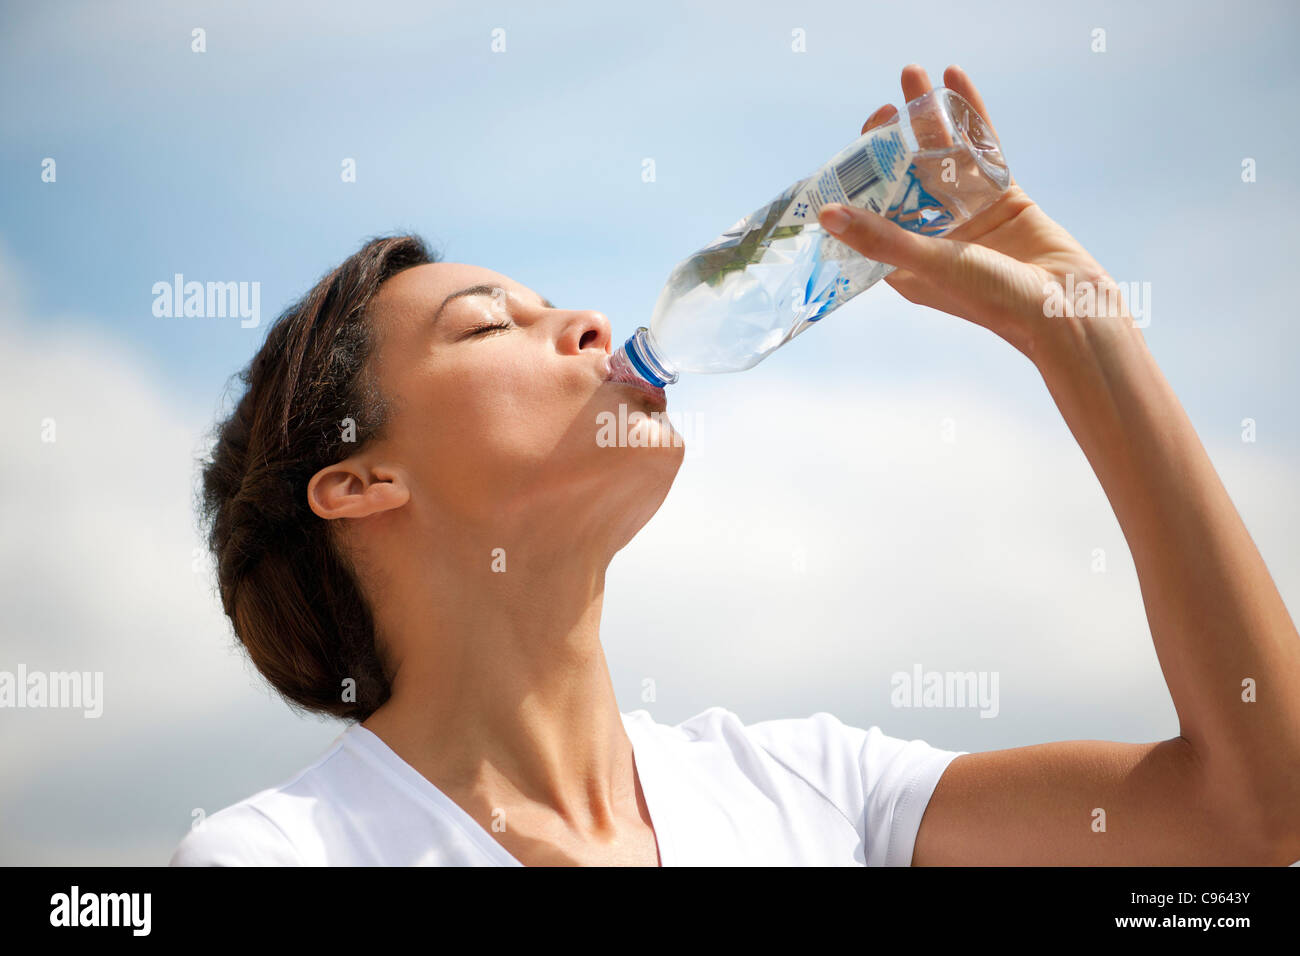 Mujer bebiendo agua embotellada. Imagen De Stock